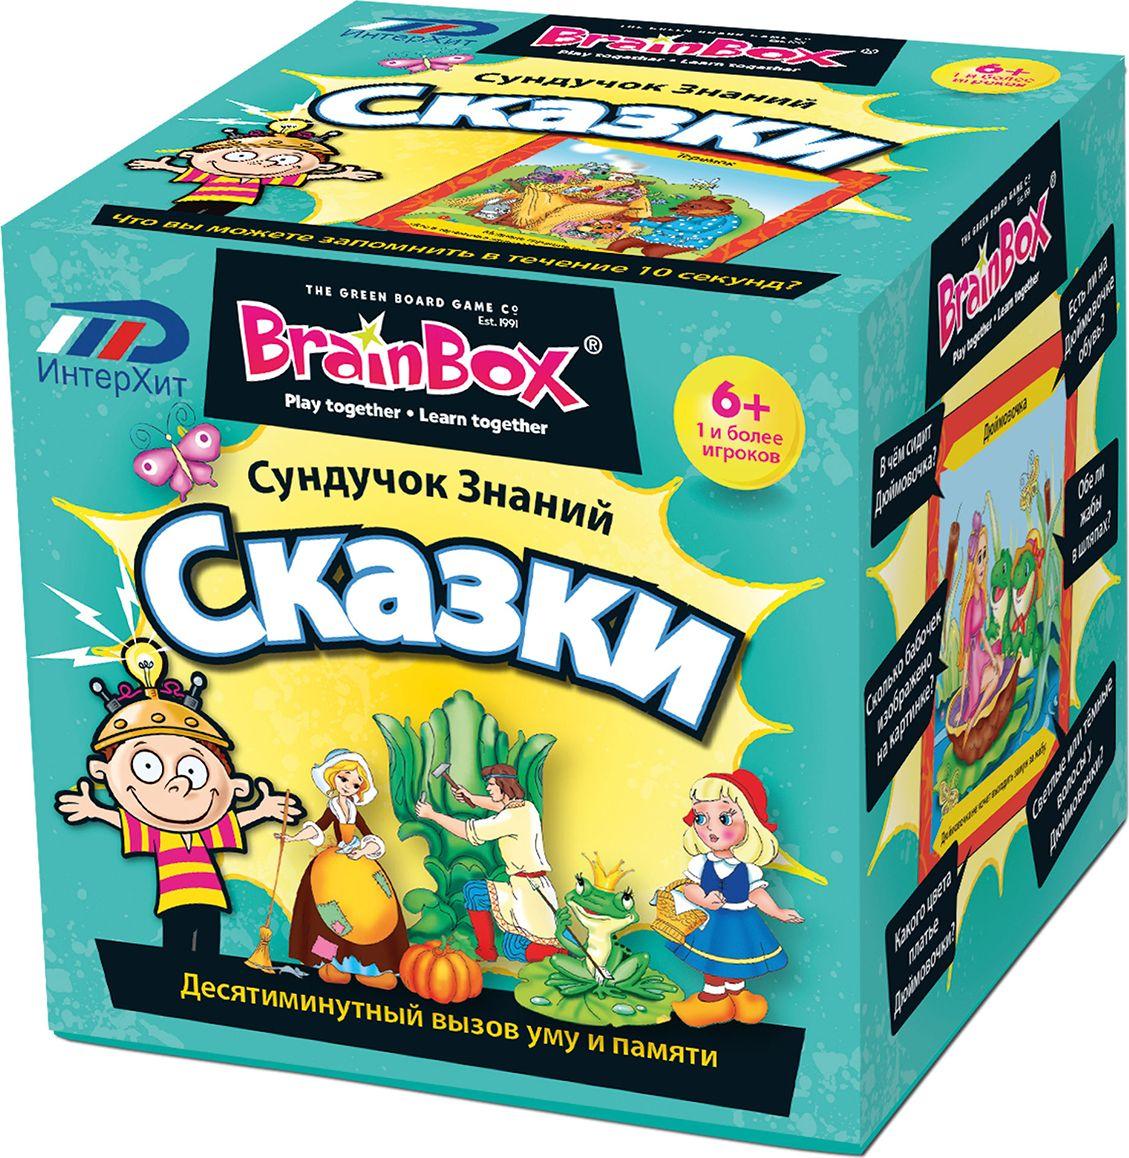 BrainBox Обучающая игра Сказки